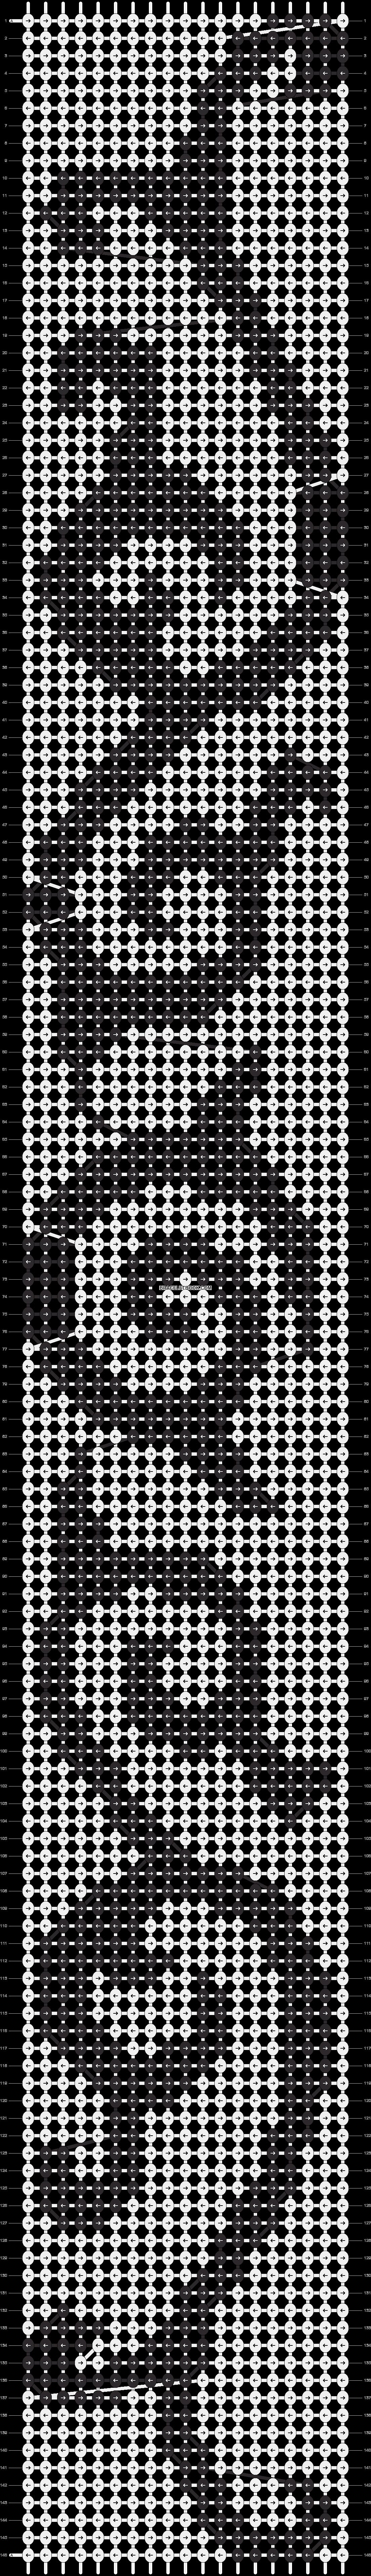 Alpha pattern #7229 pattern